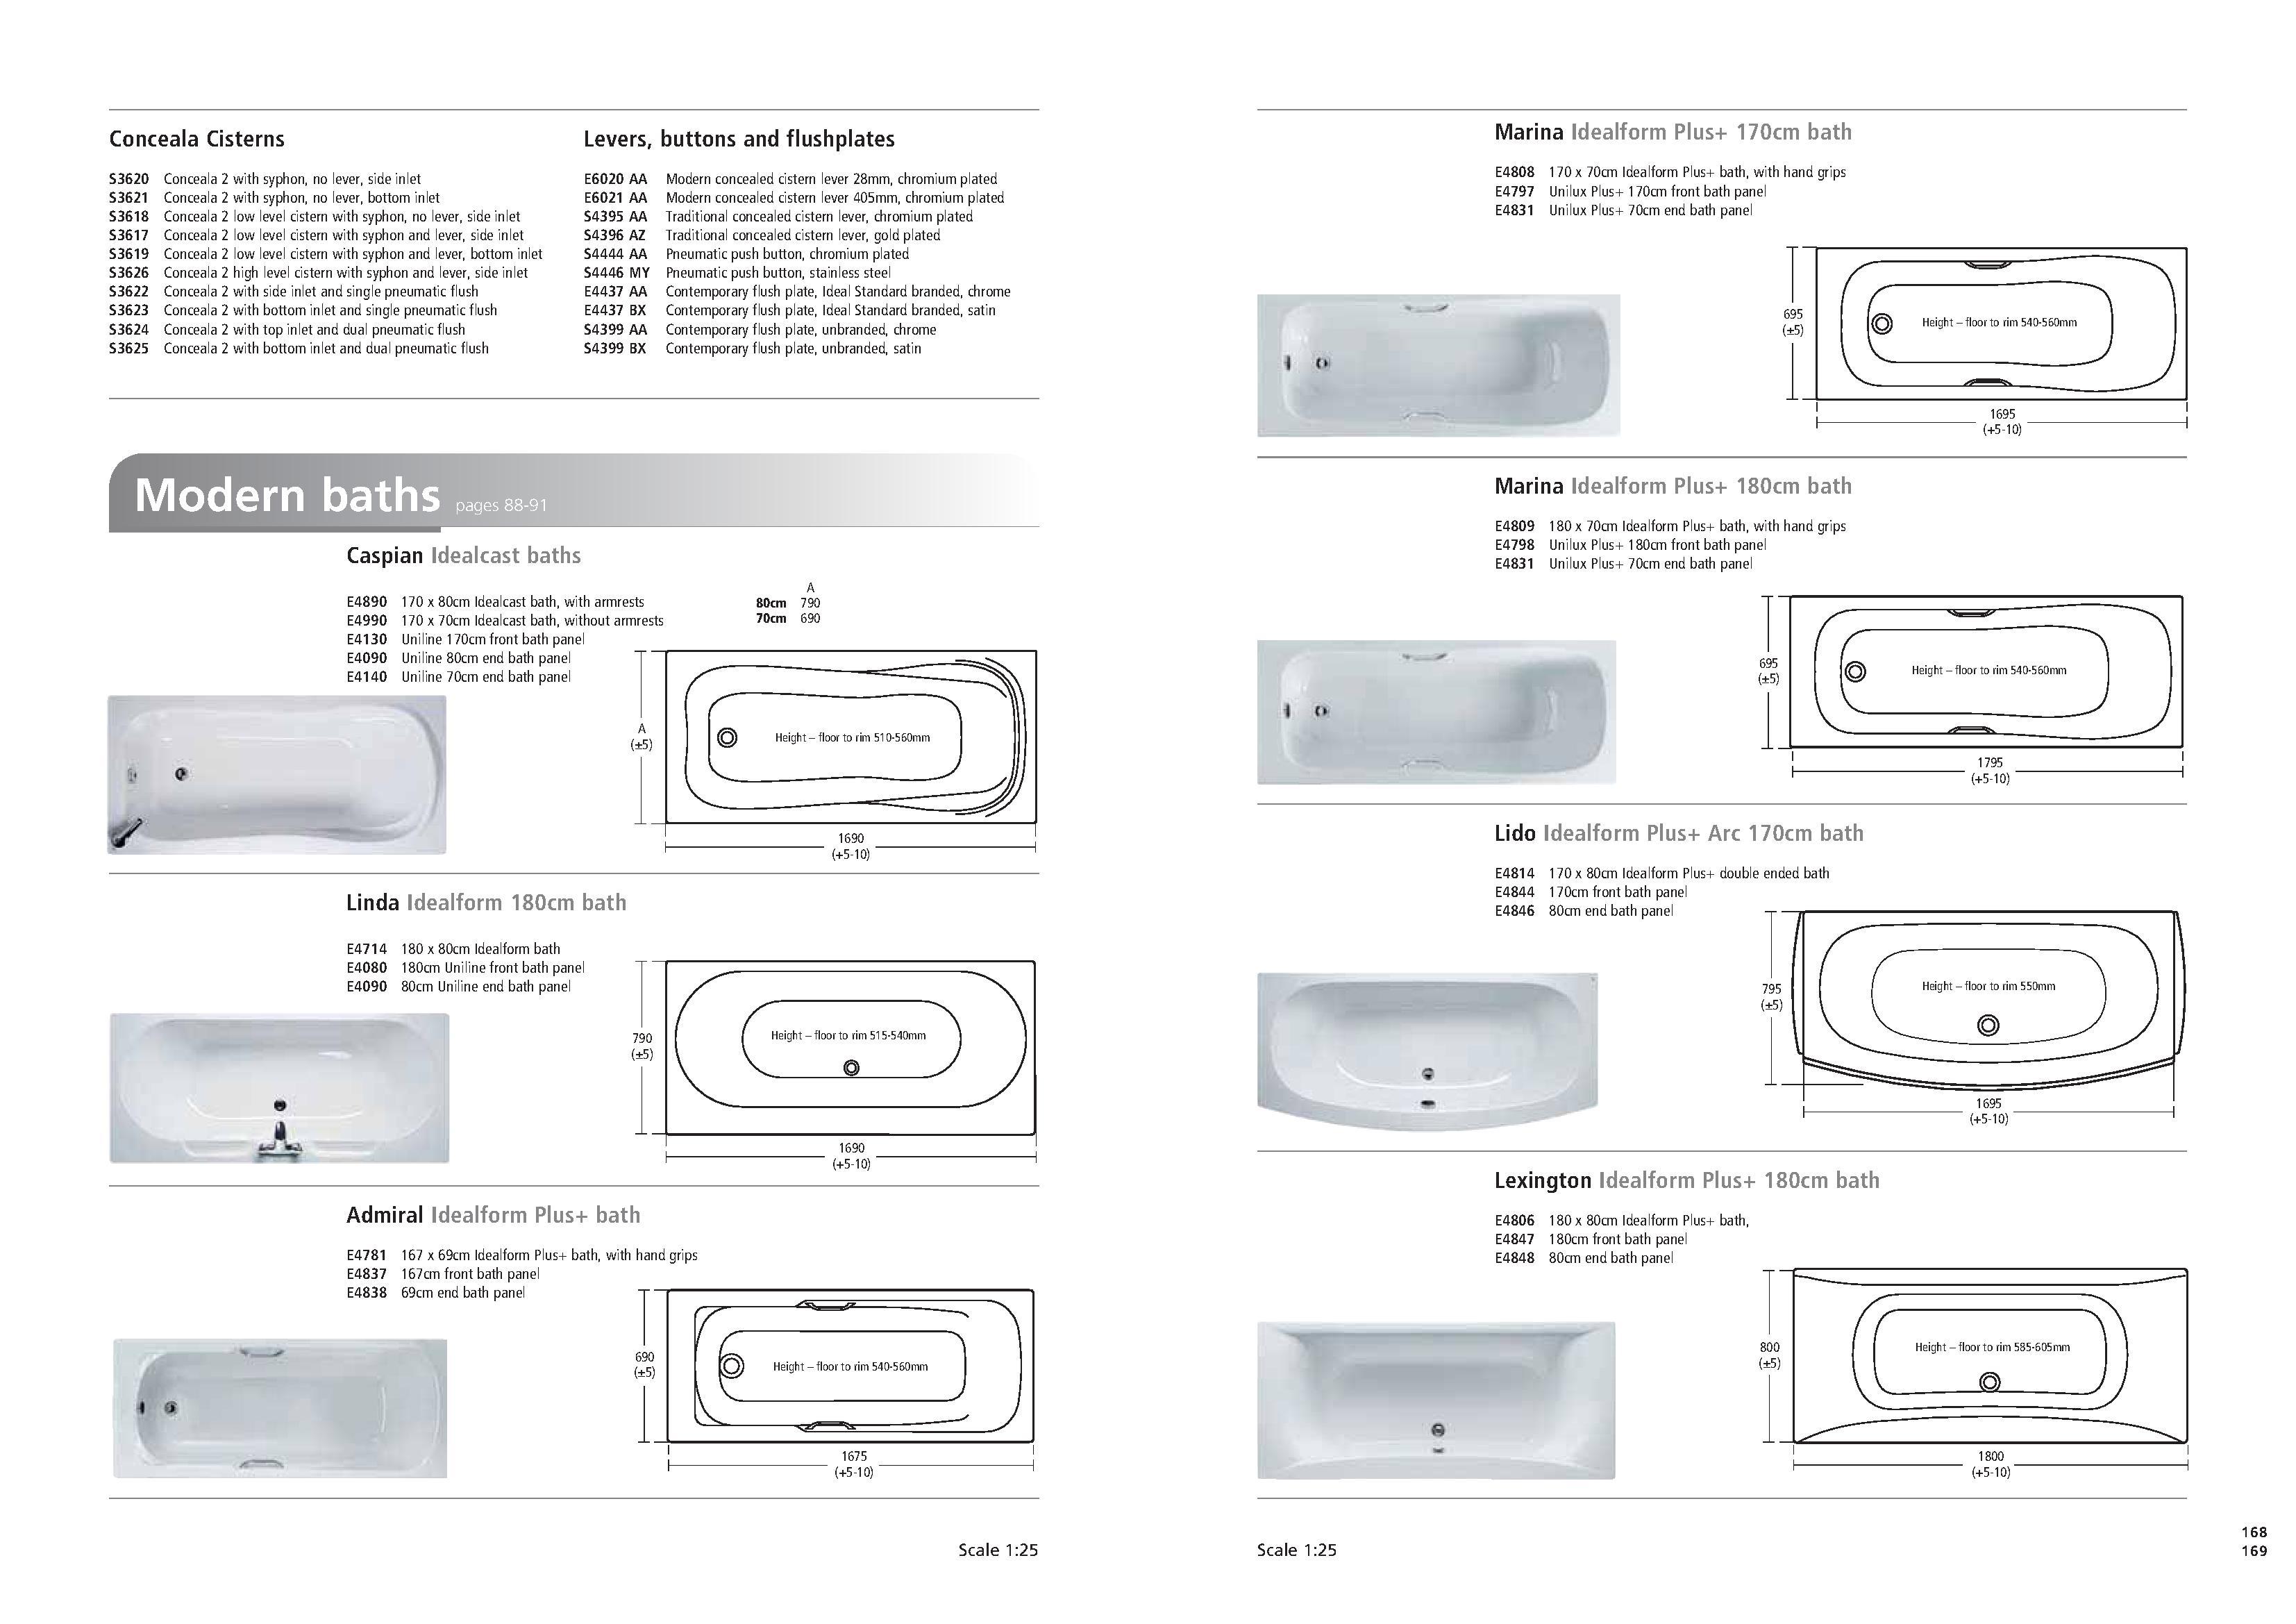 Conceala Dual Flush Cistern Pneumatic PDF